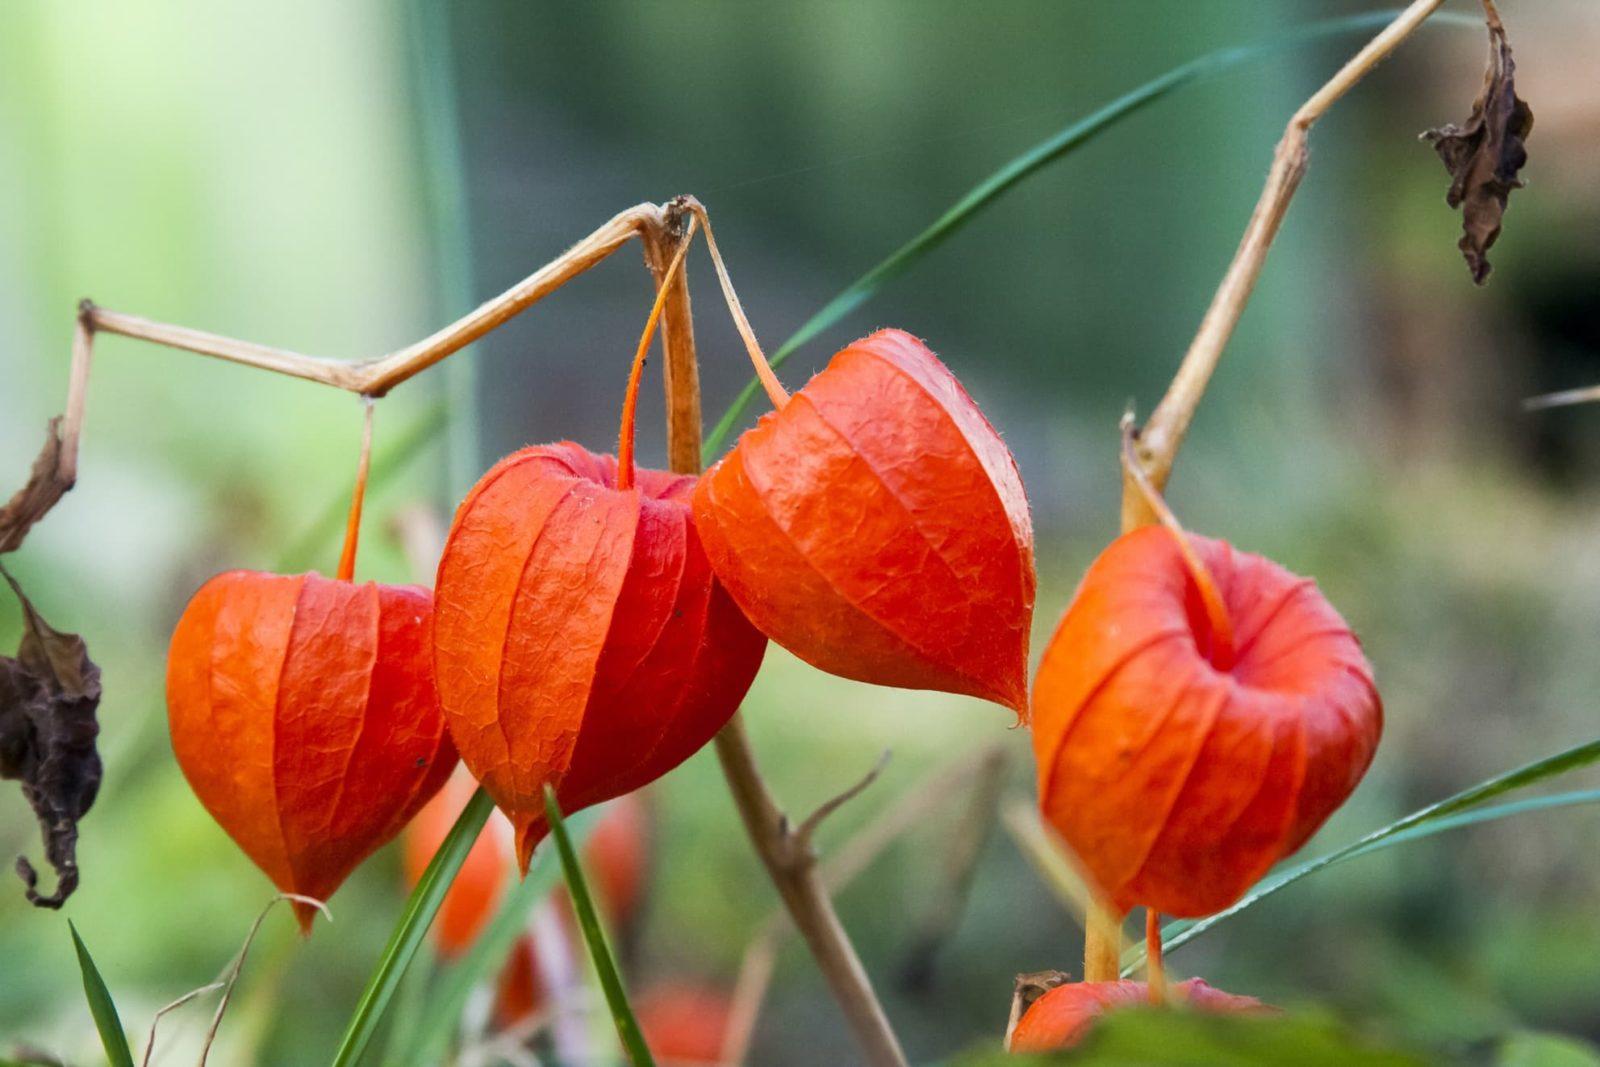 orange Physalis alkekengi plant